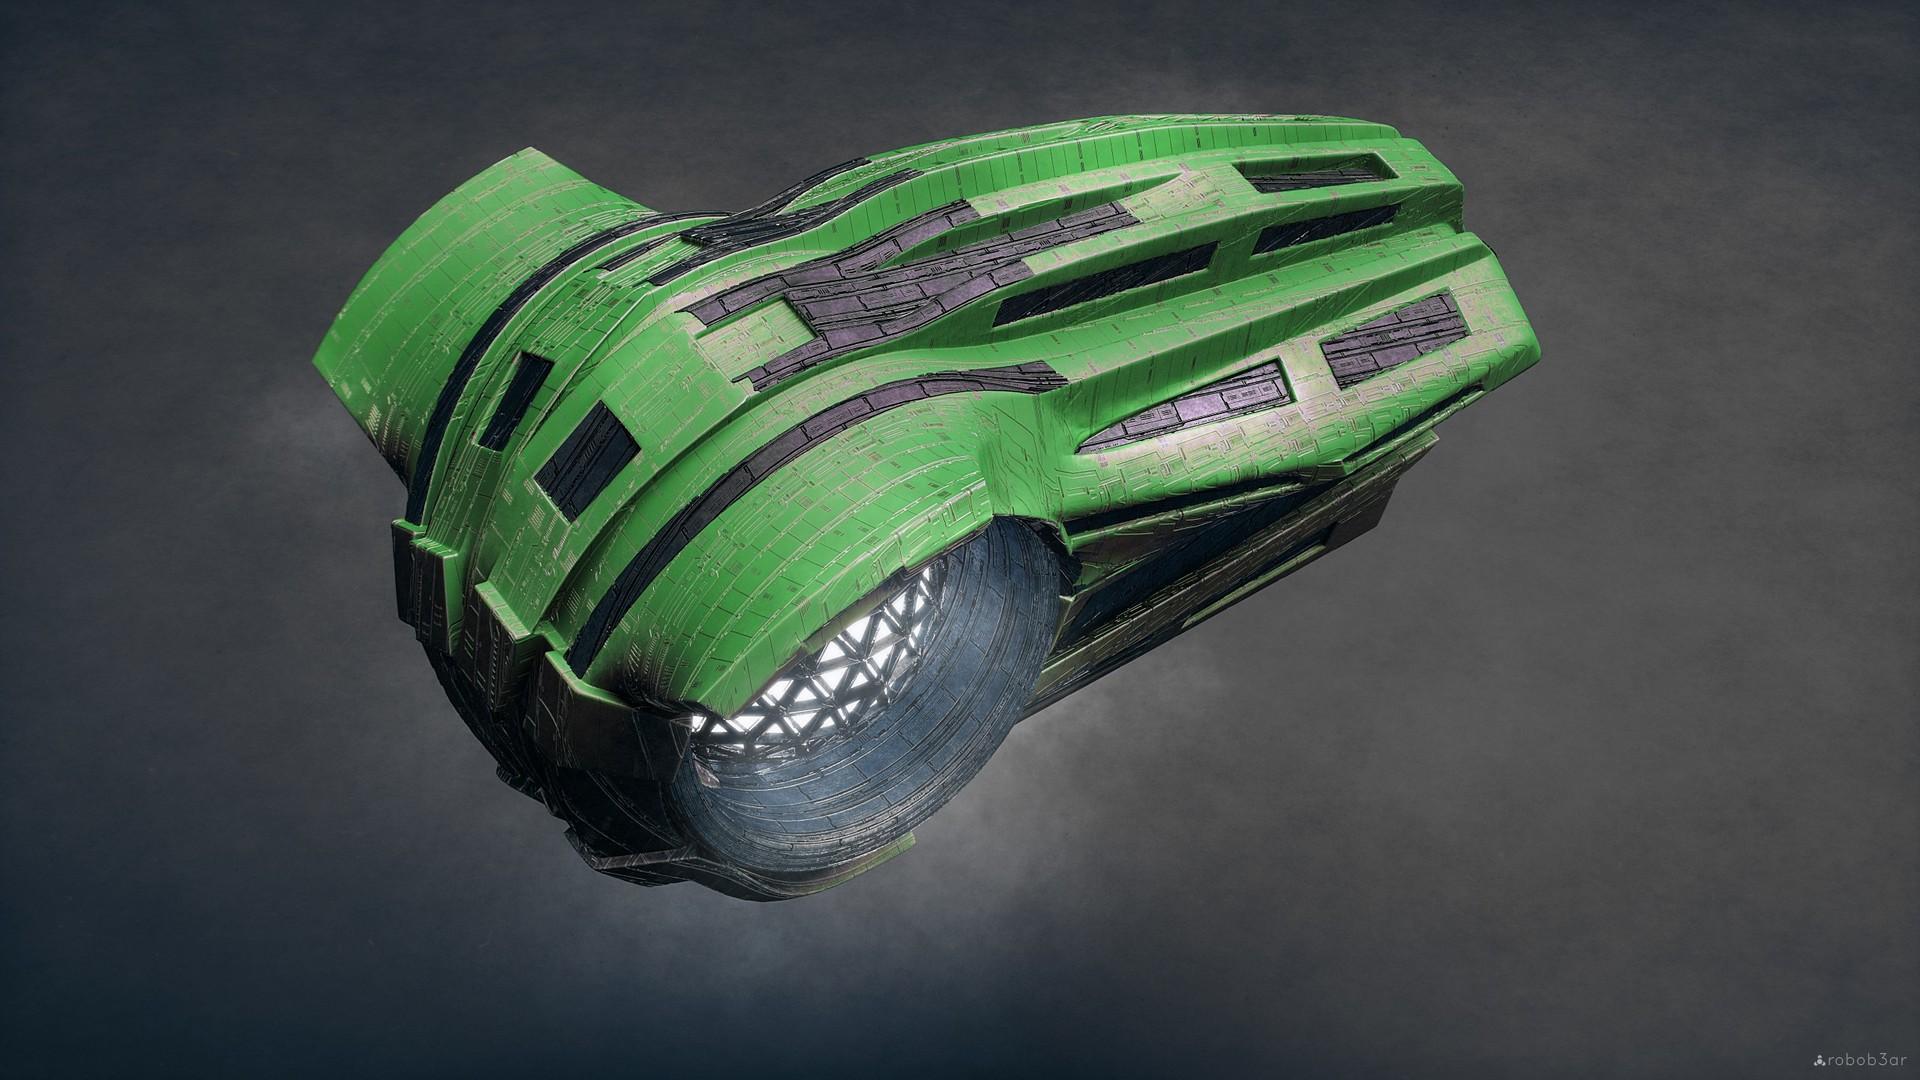 Kresimir jelusic robob3ar 463 190117 ship green ps custom